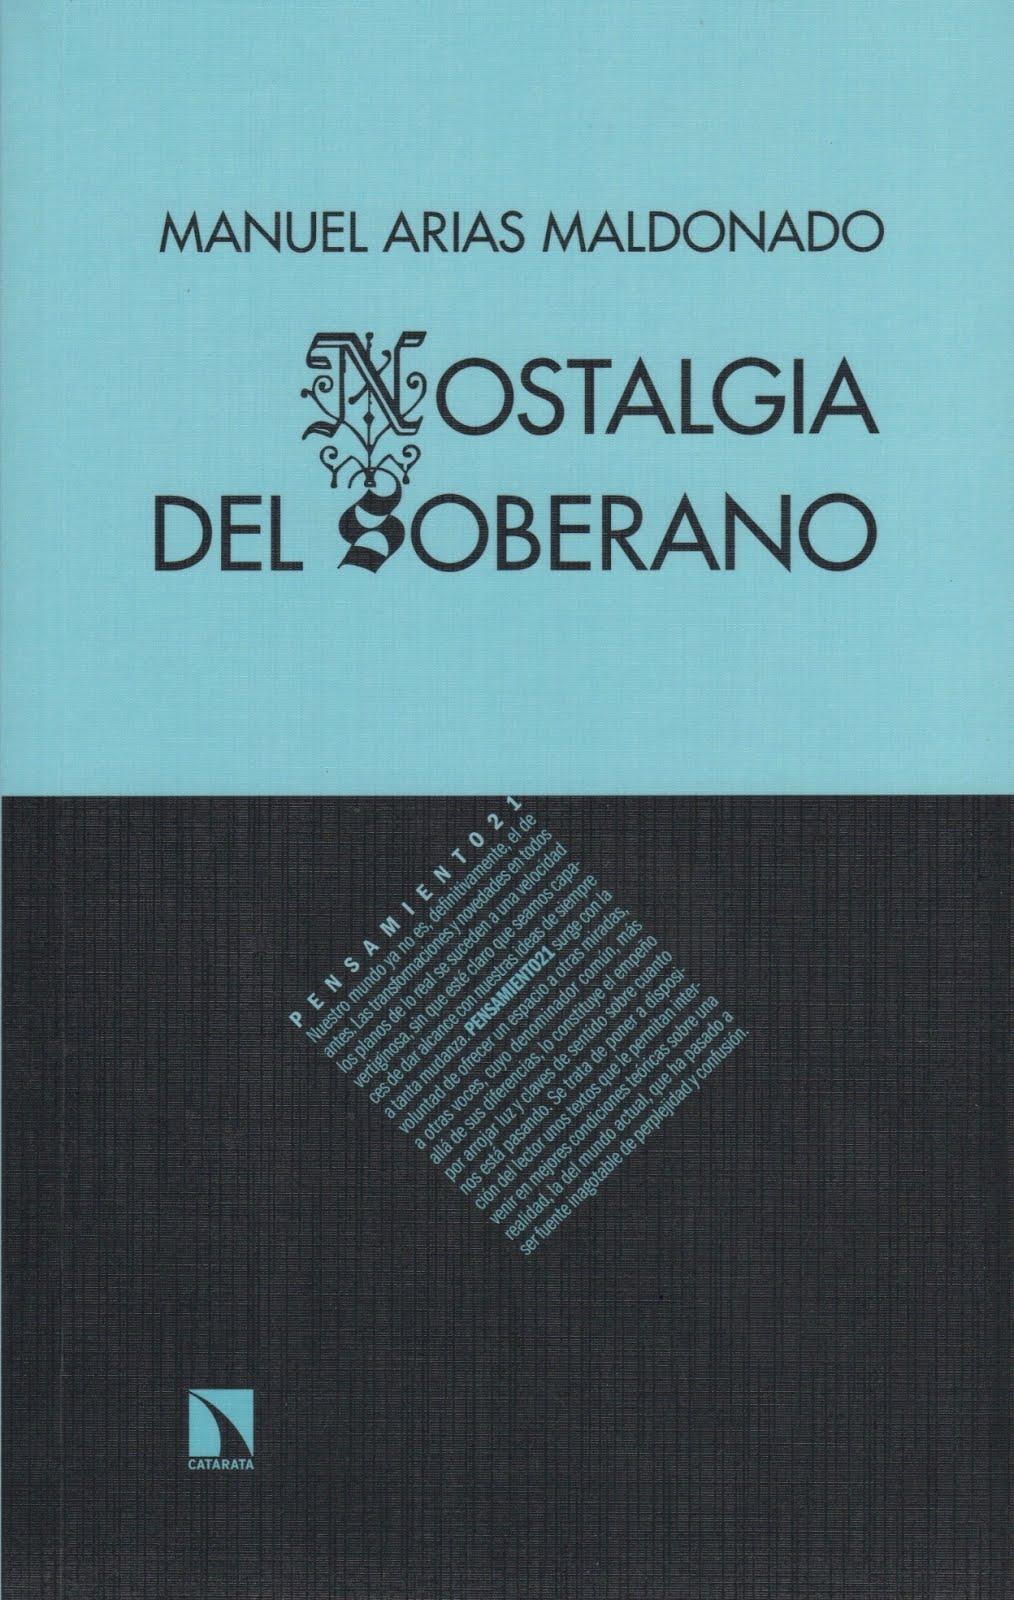 Manuel Arias Maldonado (Nostalgia del soberano)